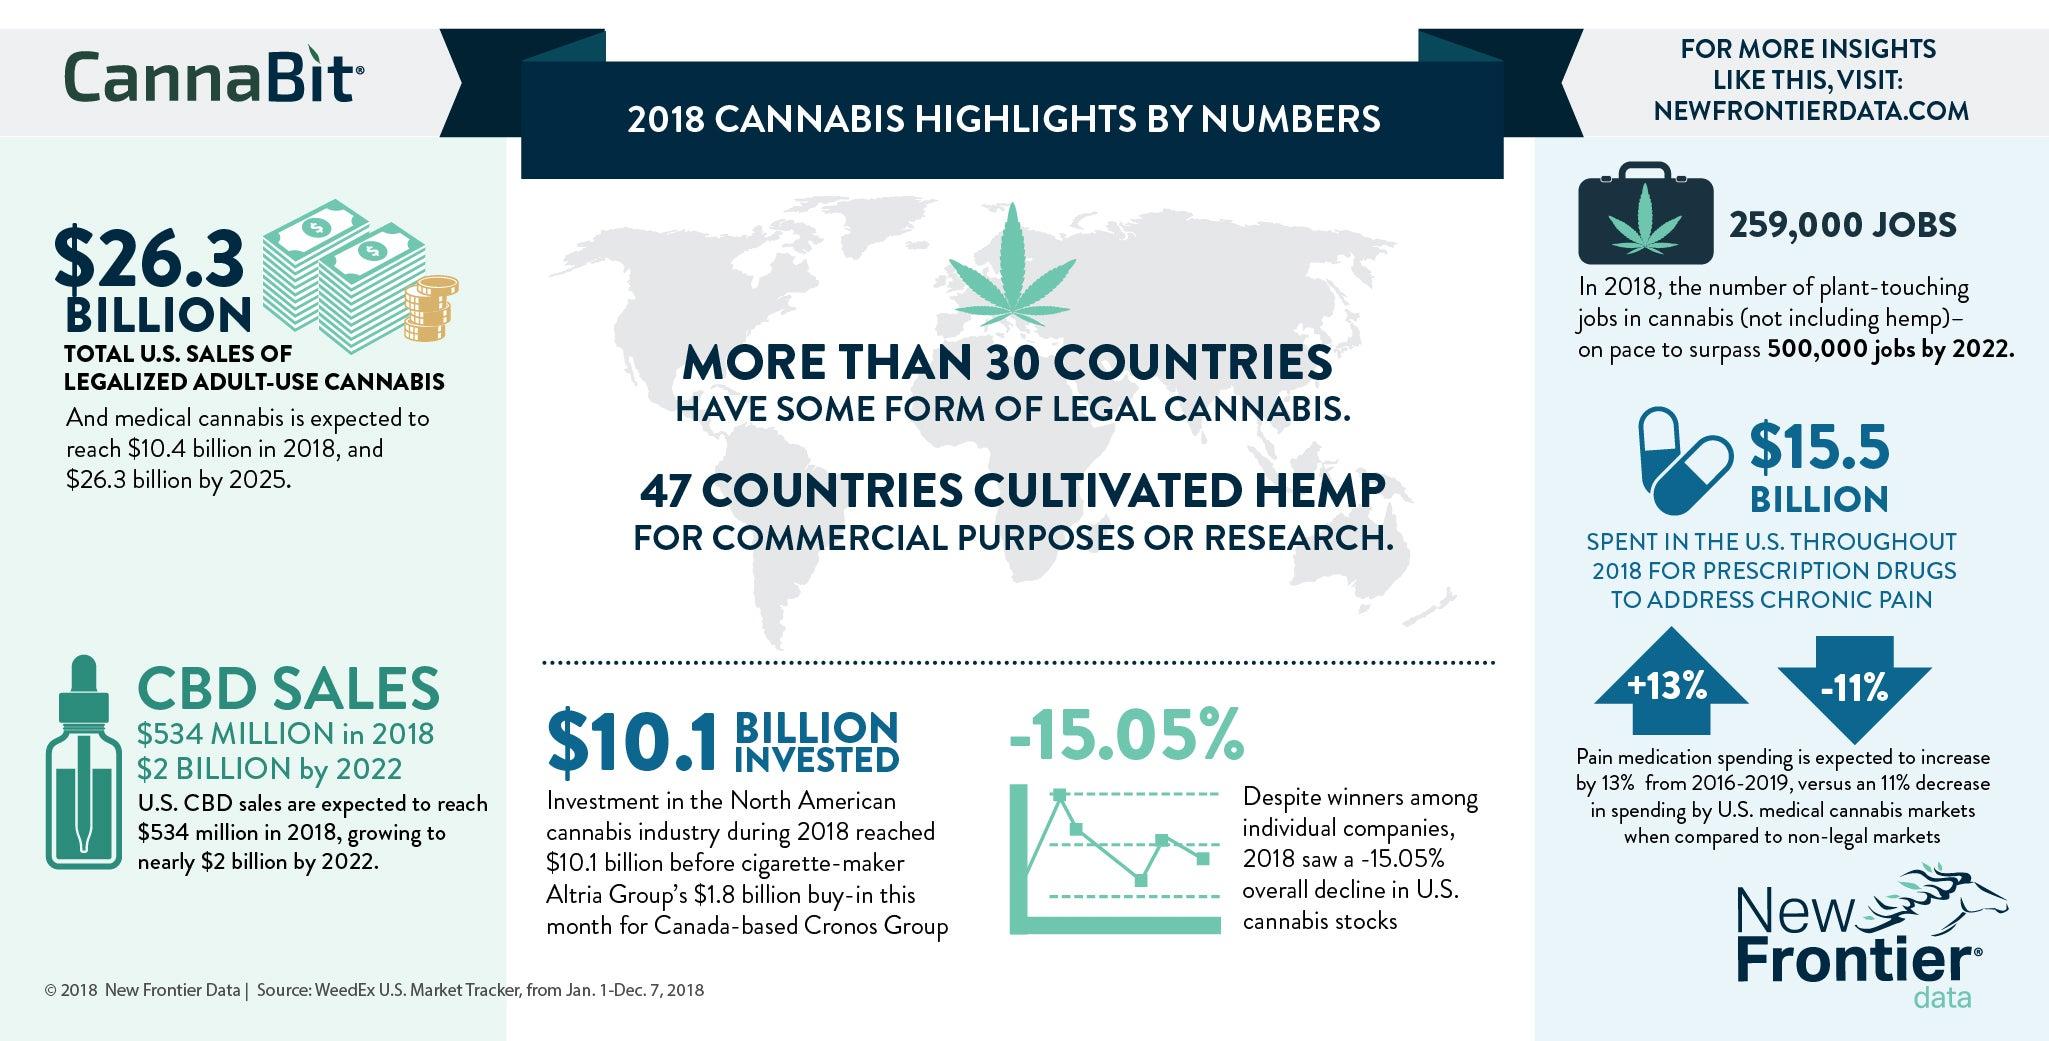 12-14-2018-cannabit-infographic.jpg